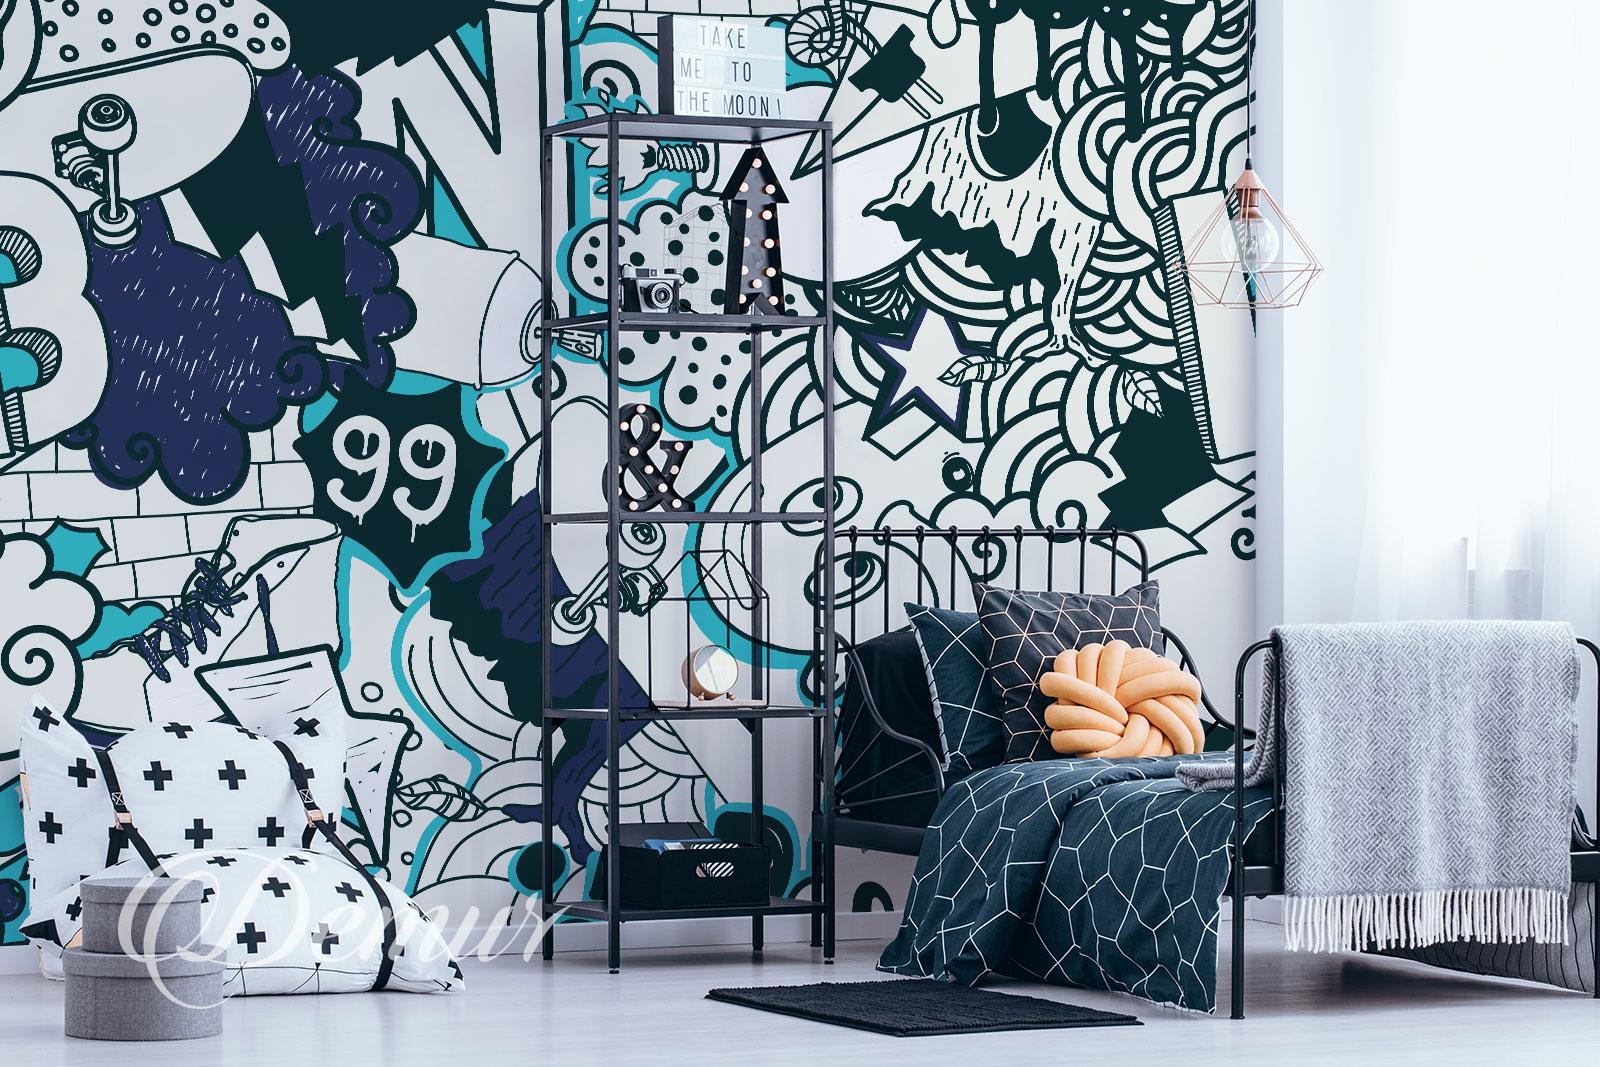 Fototapeta graffiti - Aranżacja pokoju nastolatka - Demur